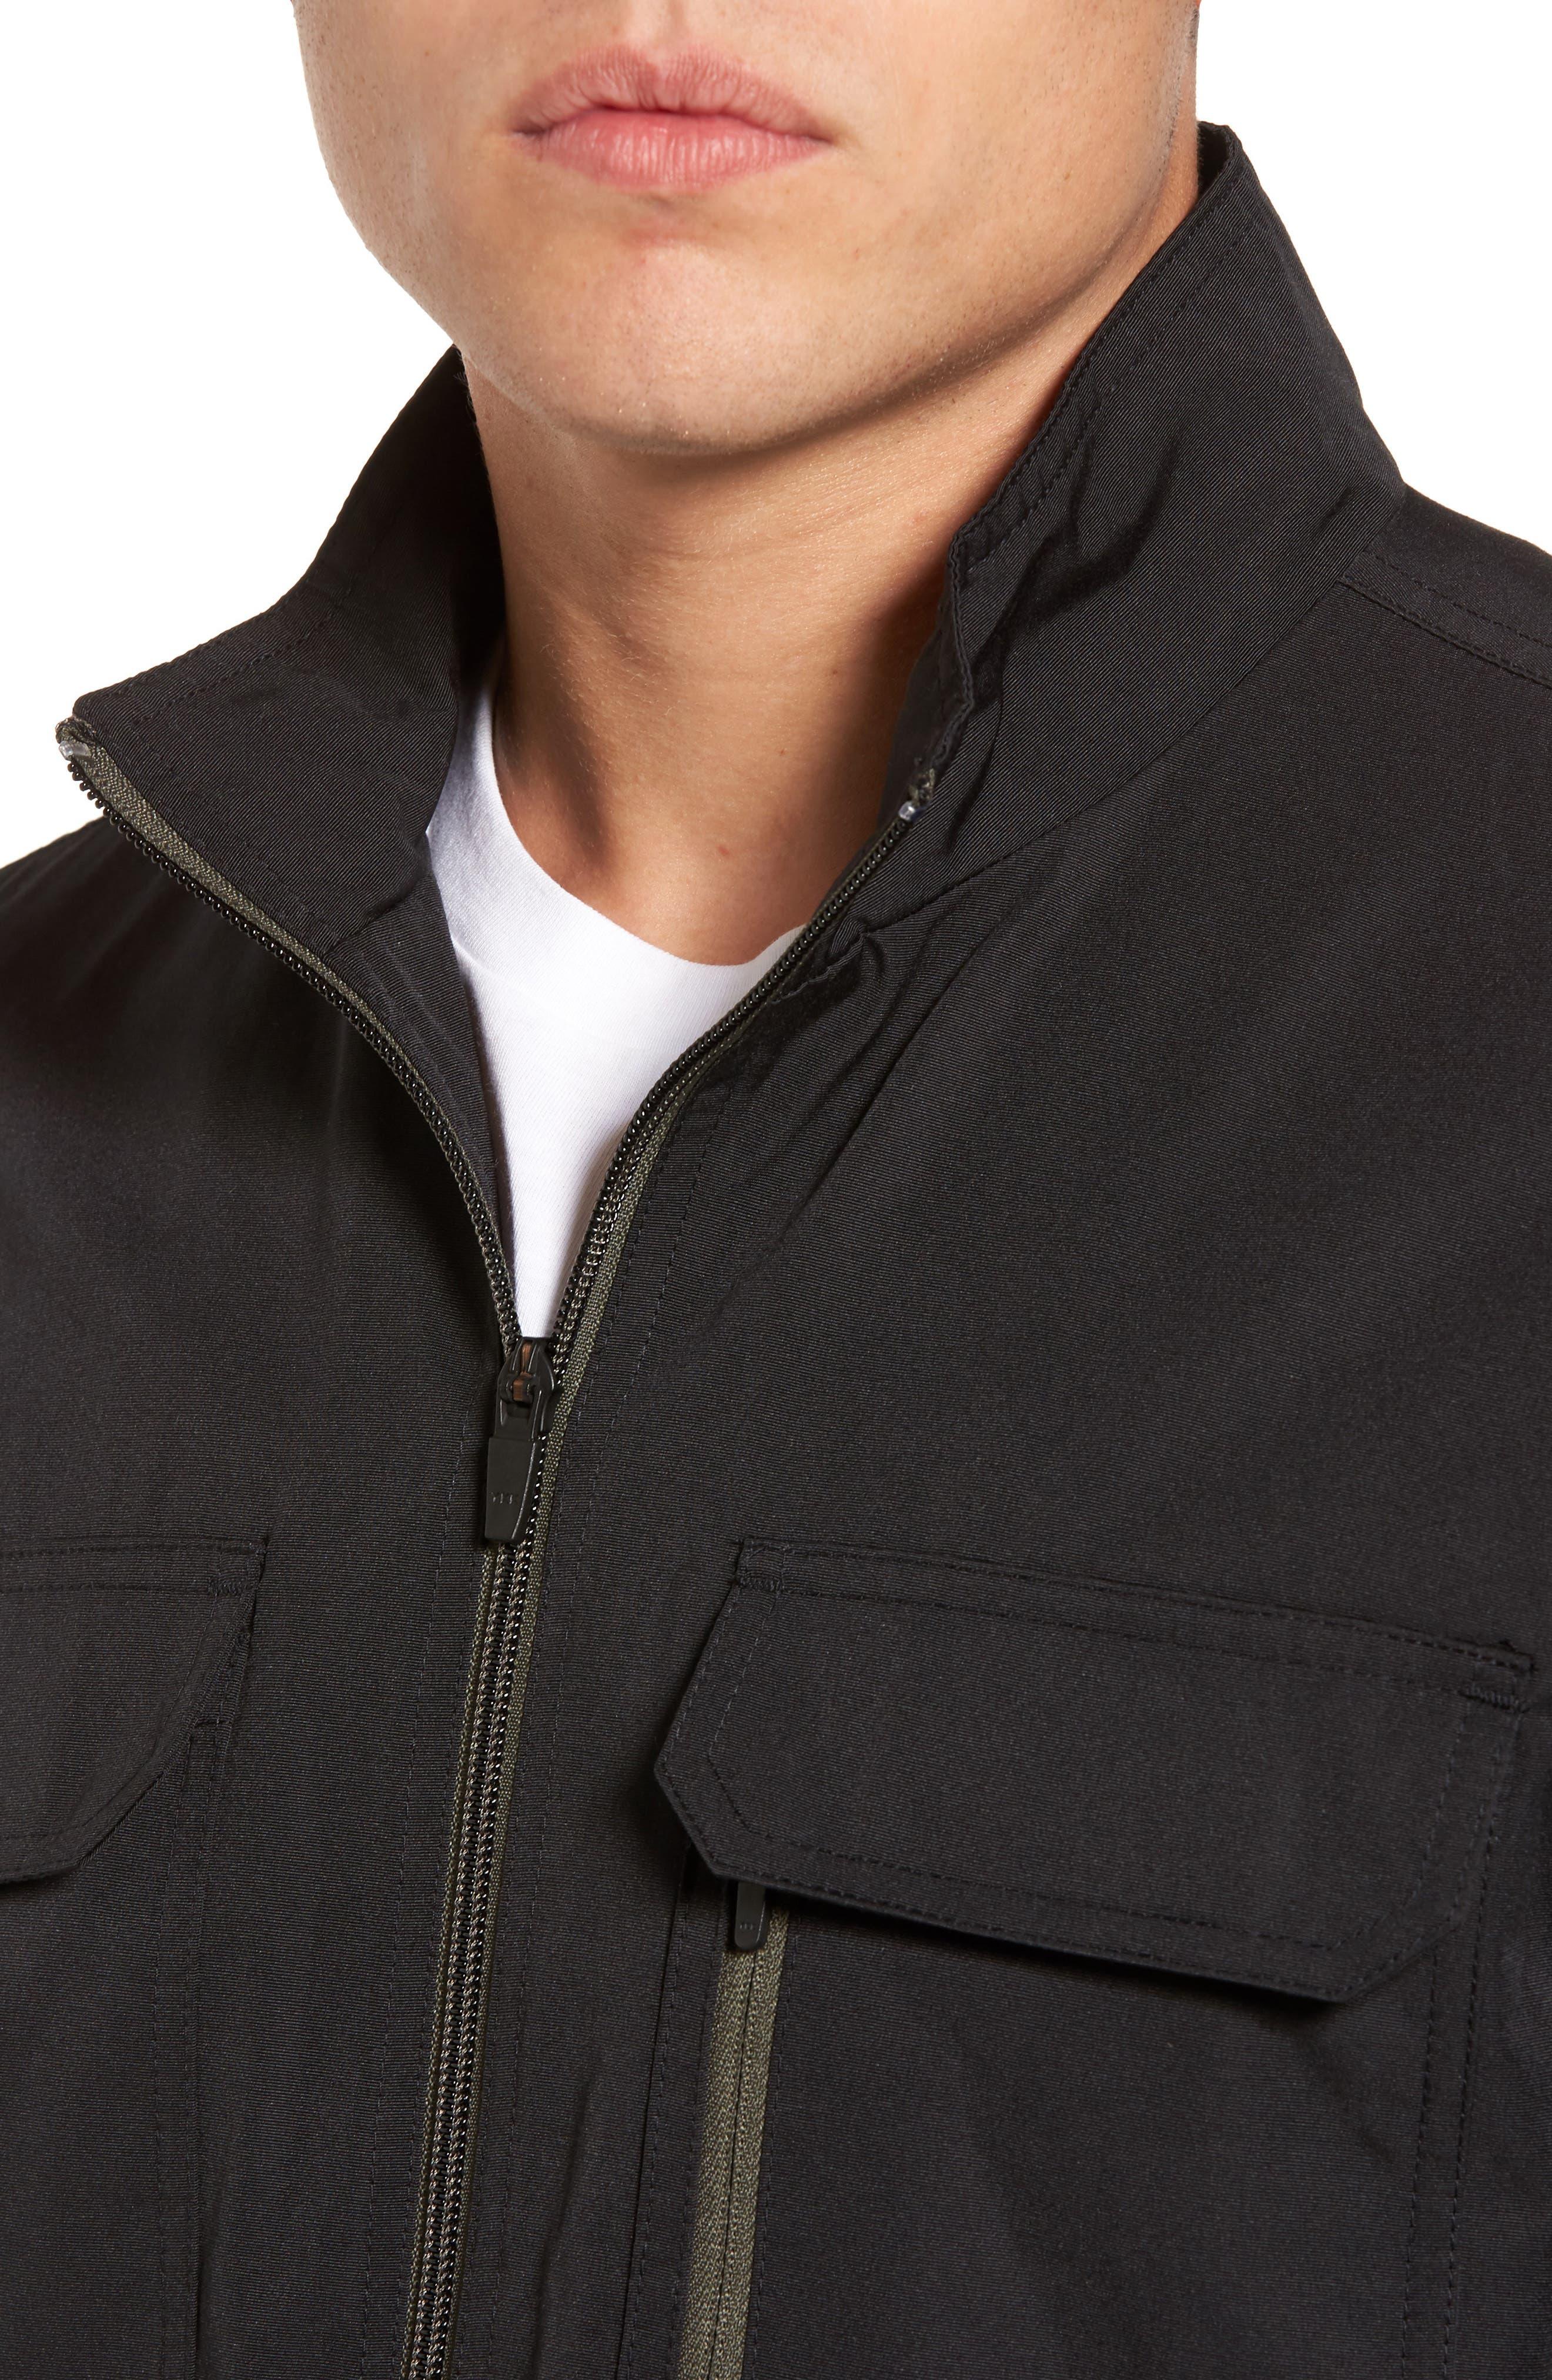 Staple Jacket,                             Alternate thumbnail 4, color,                             002